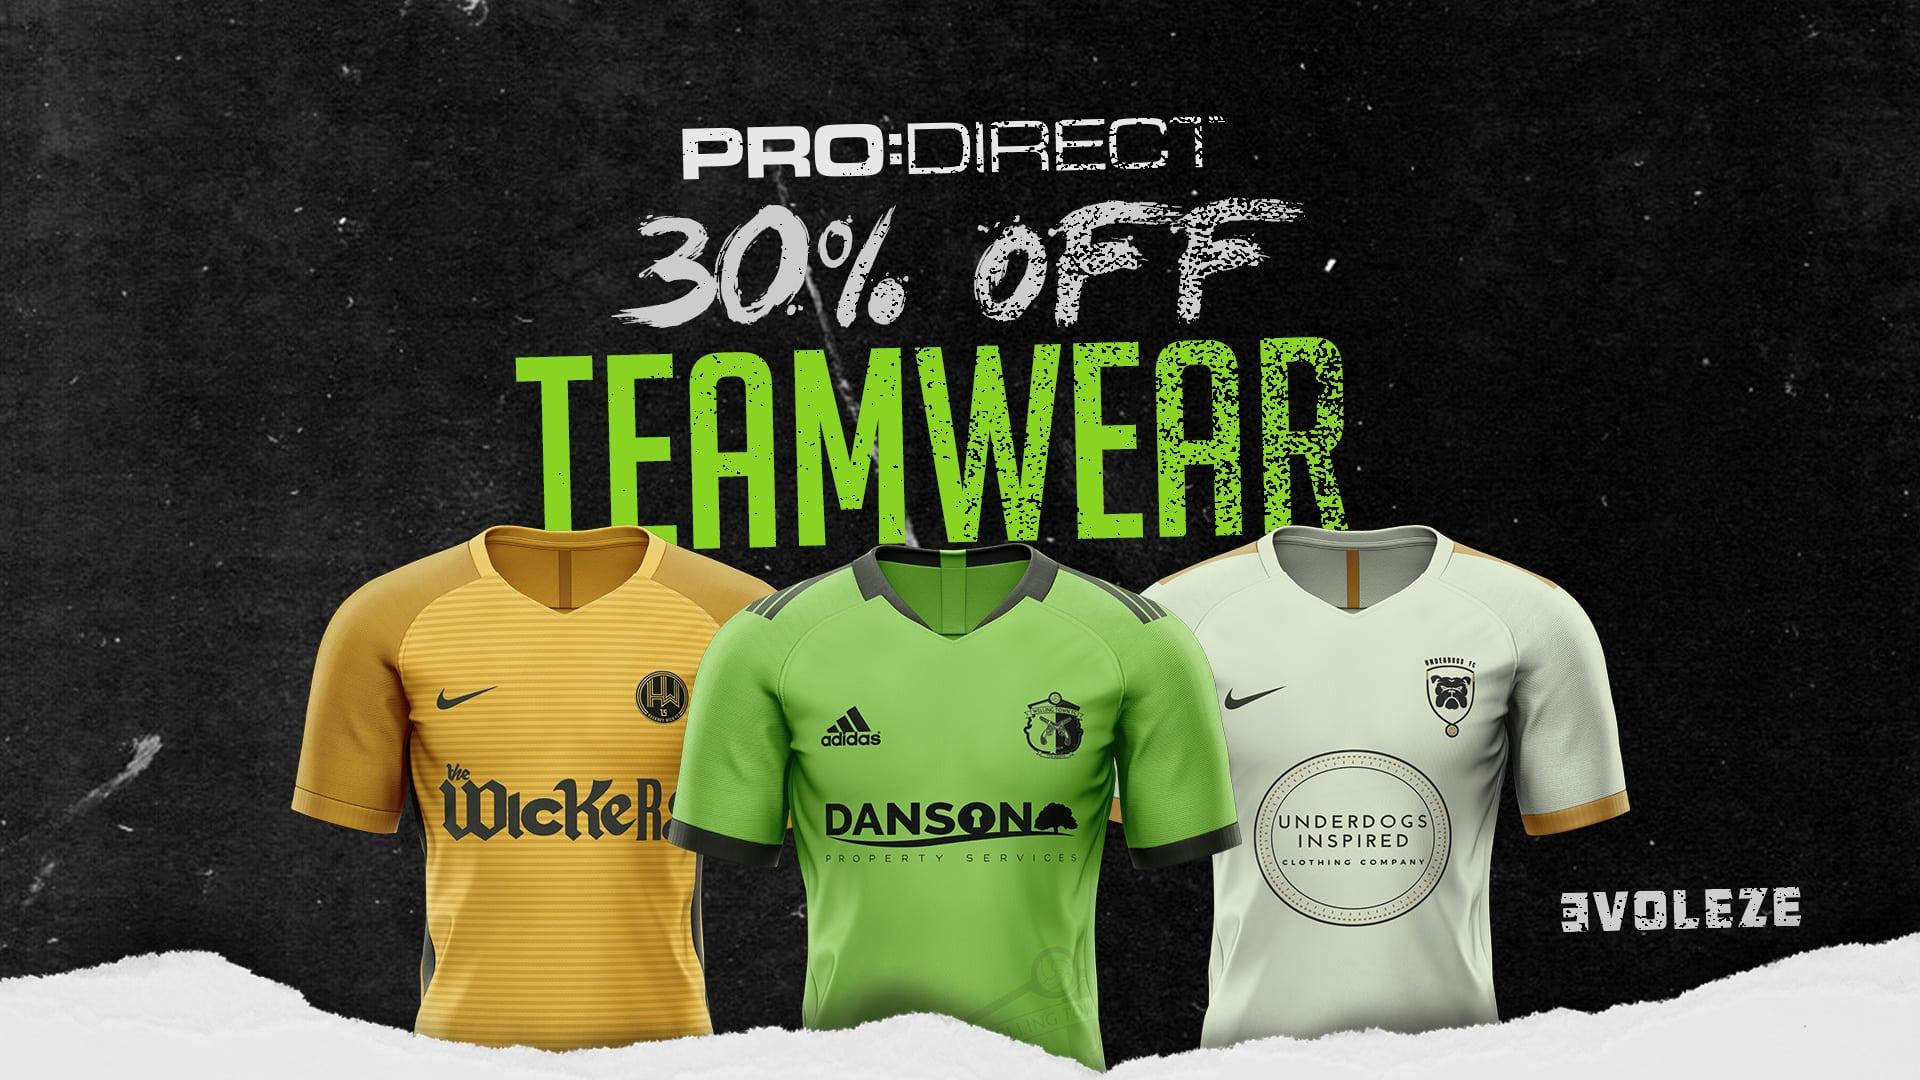 teamwear discount